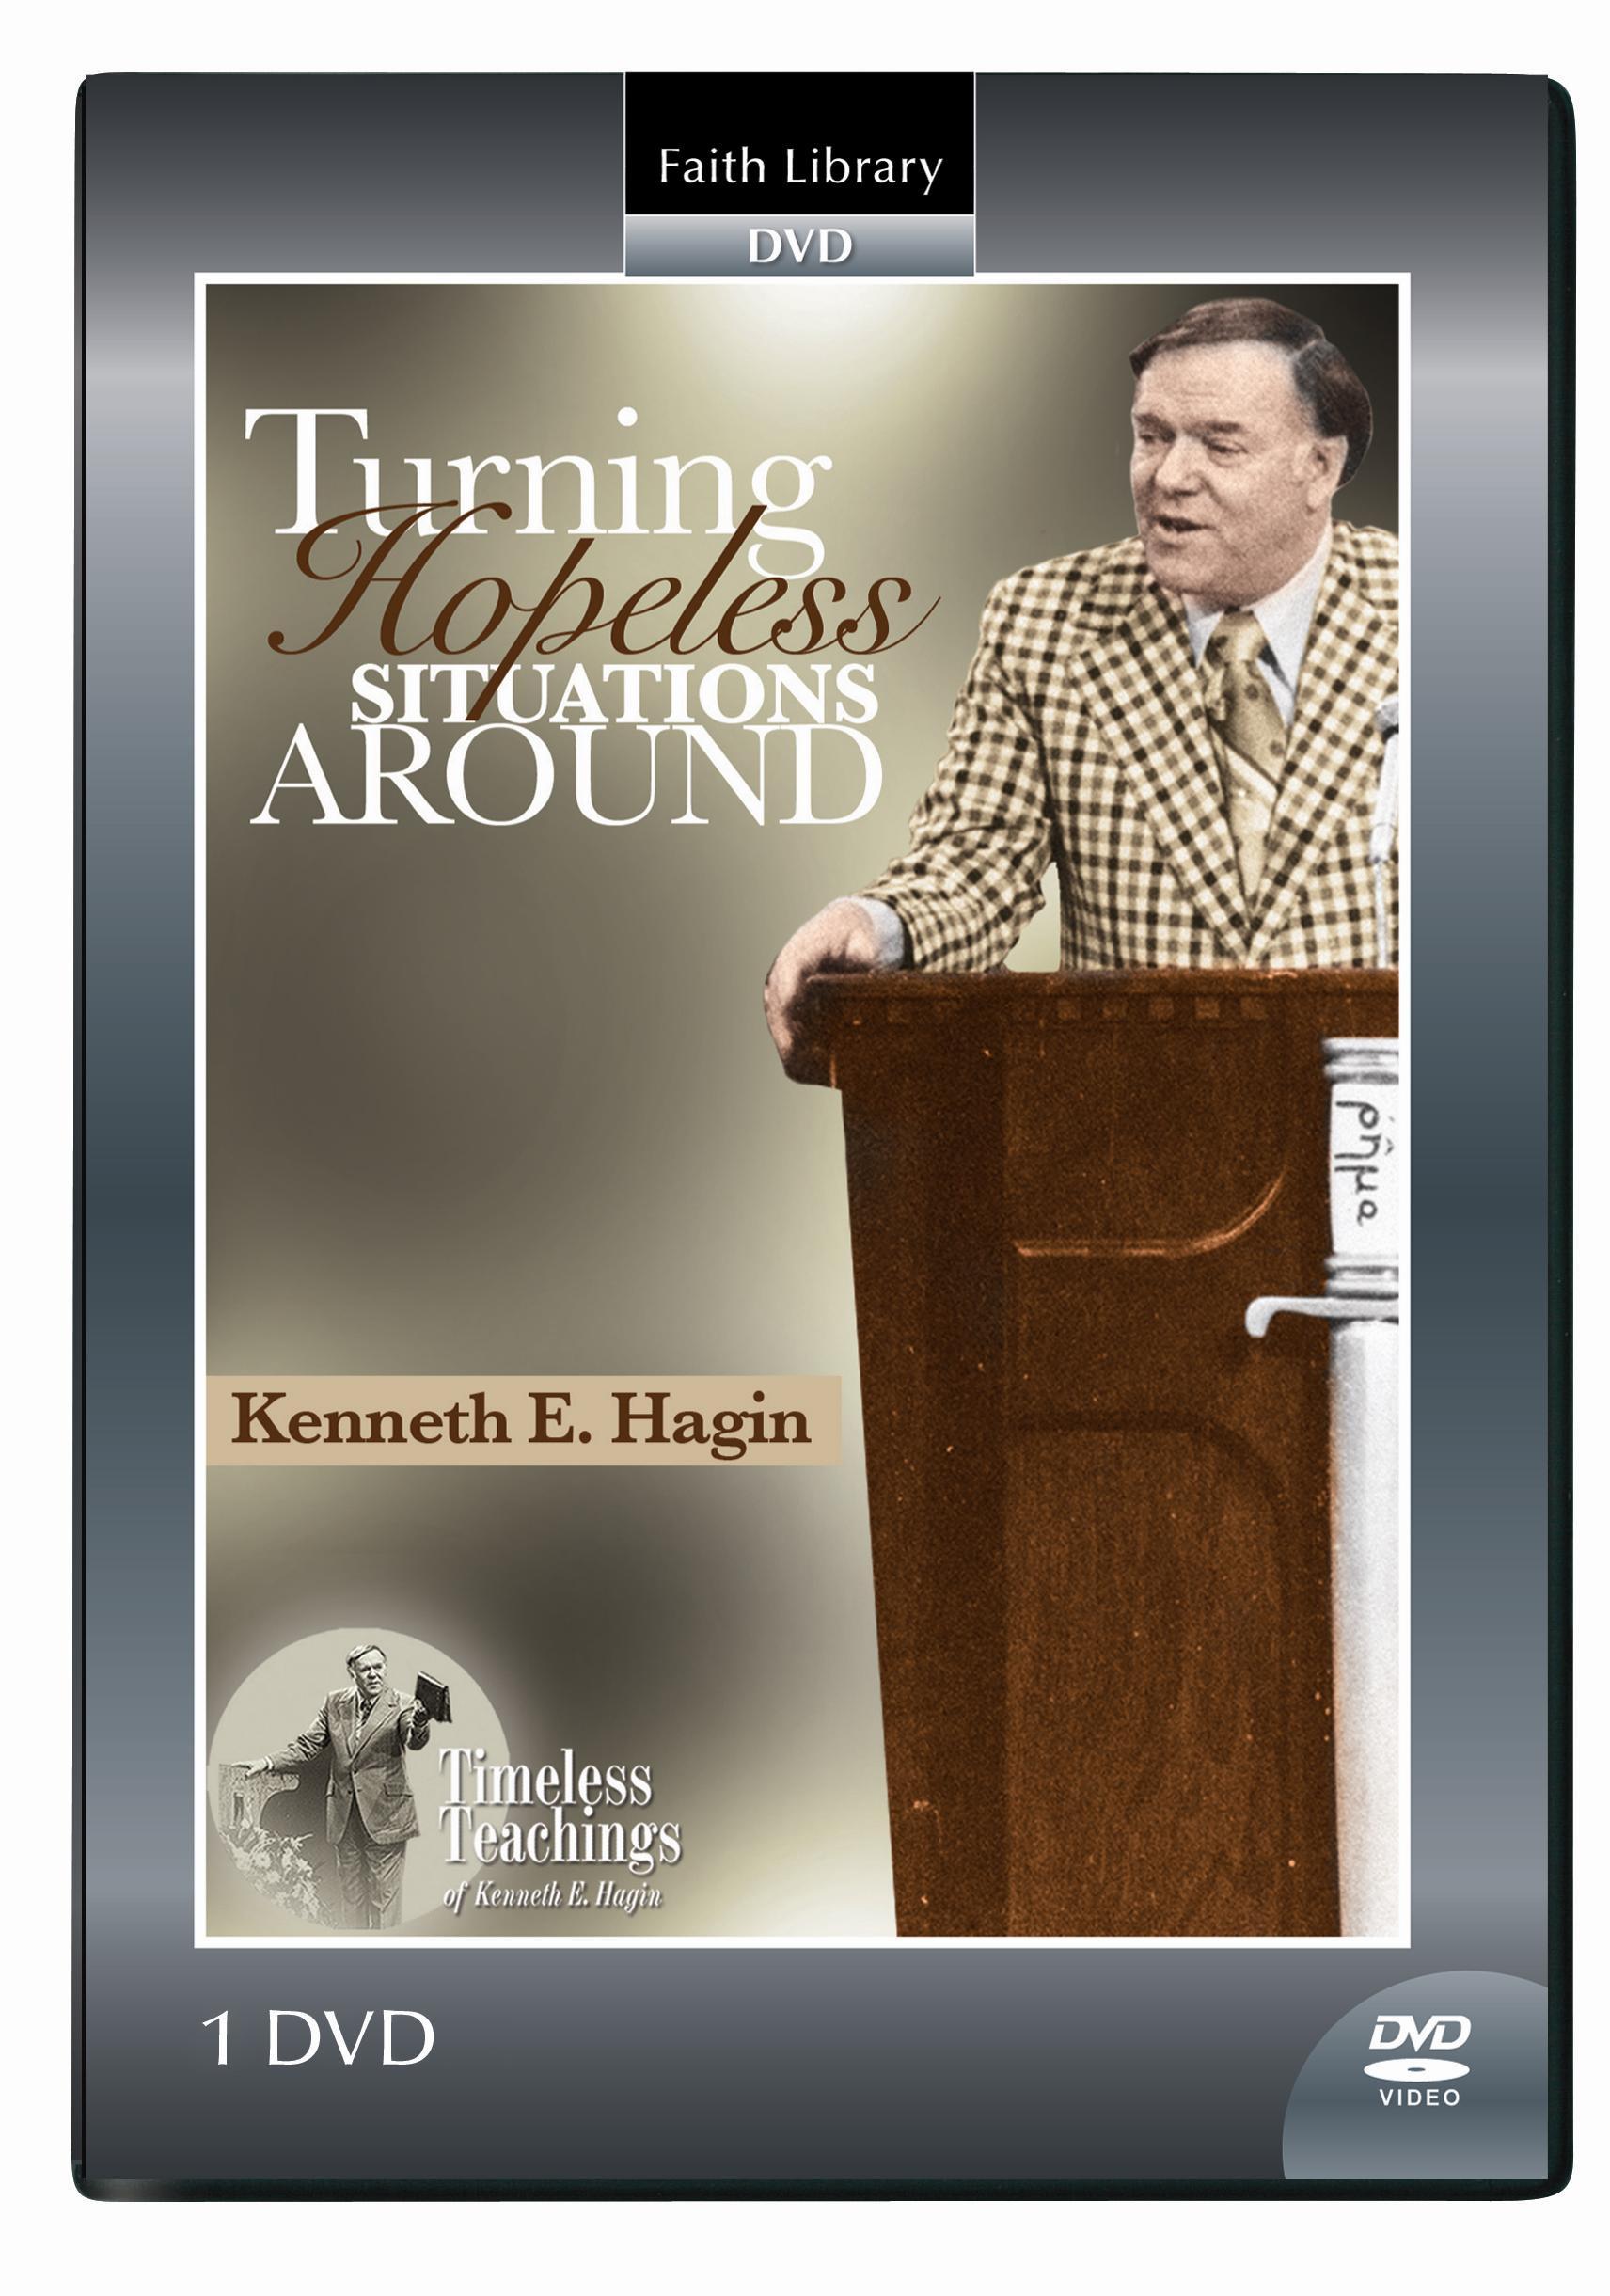 Turning Hopeless Situations Around (1 DVD)